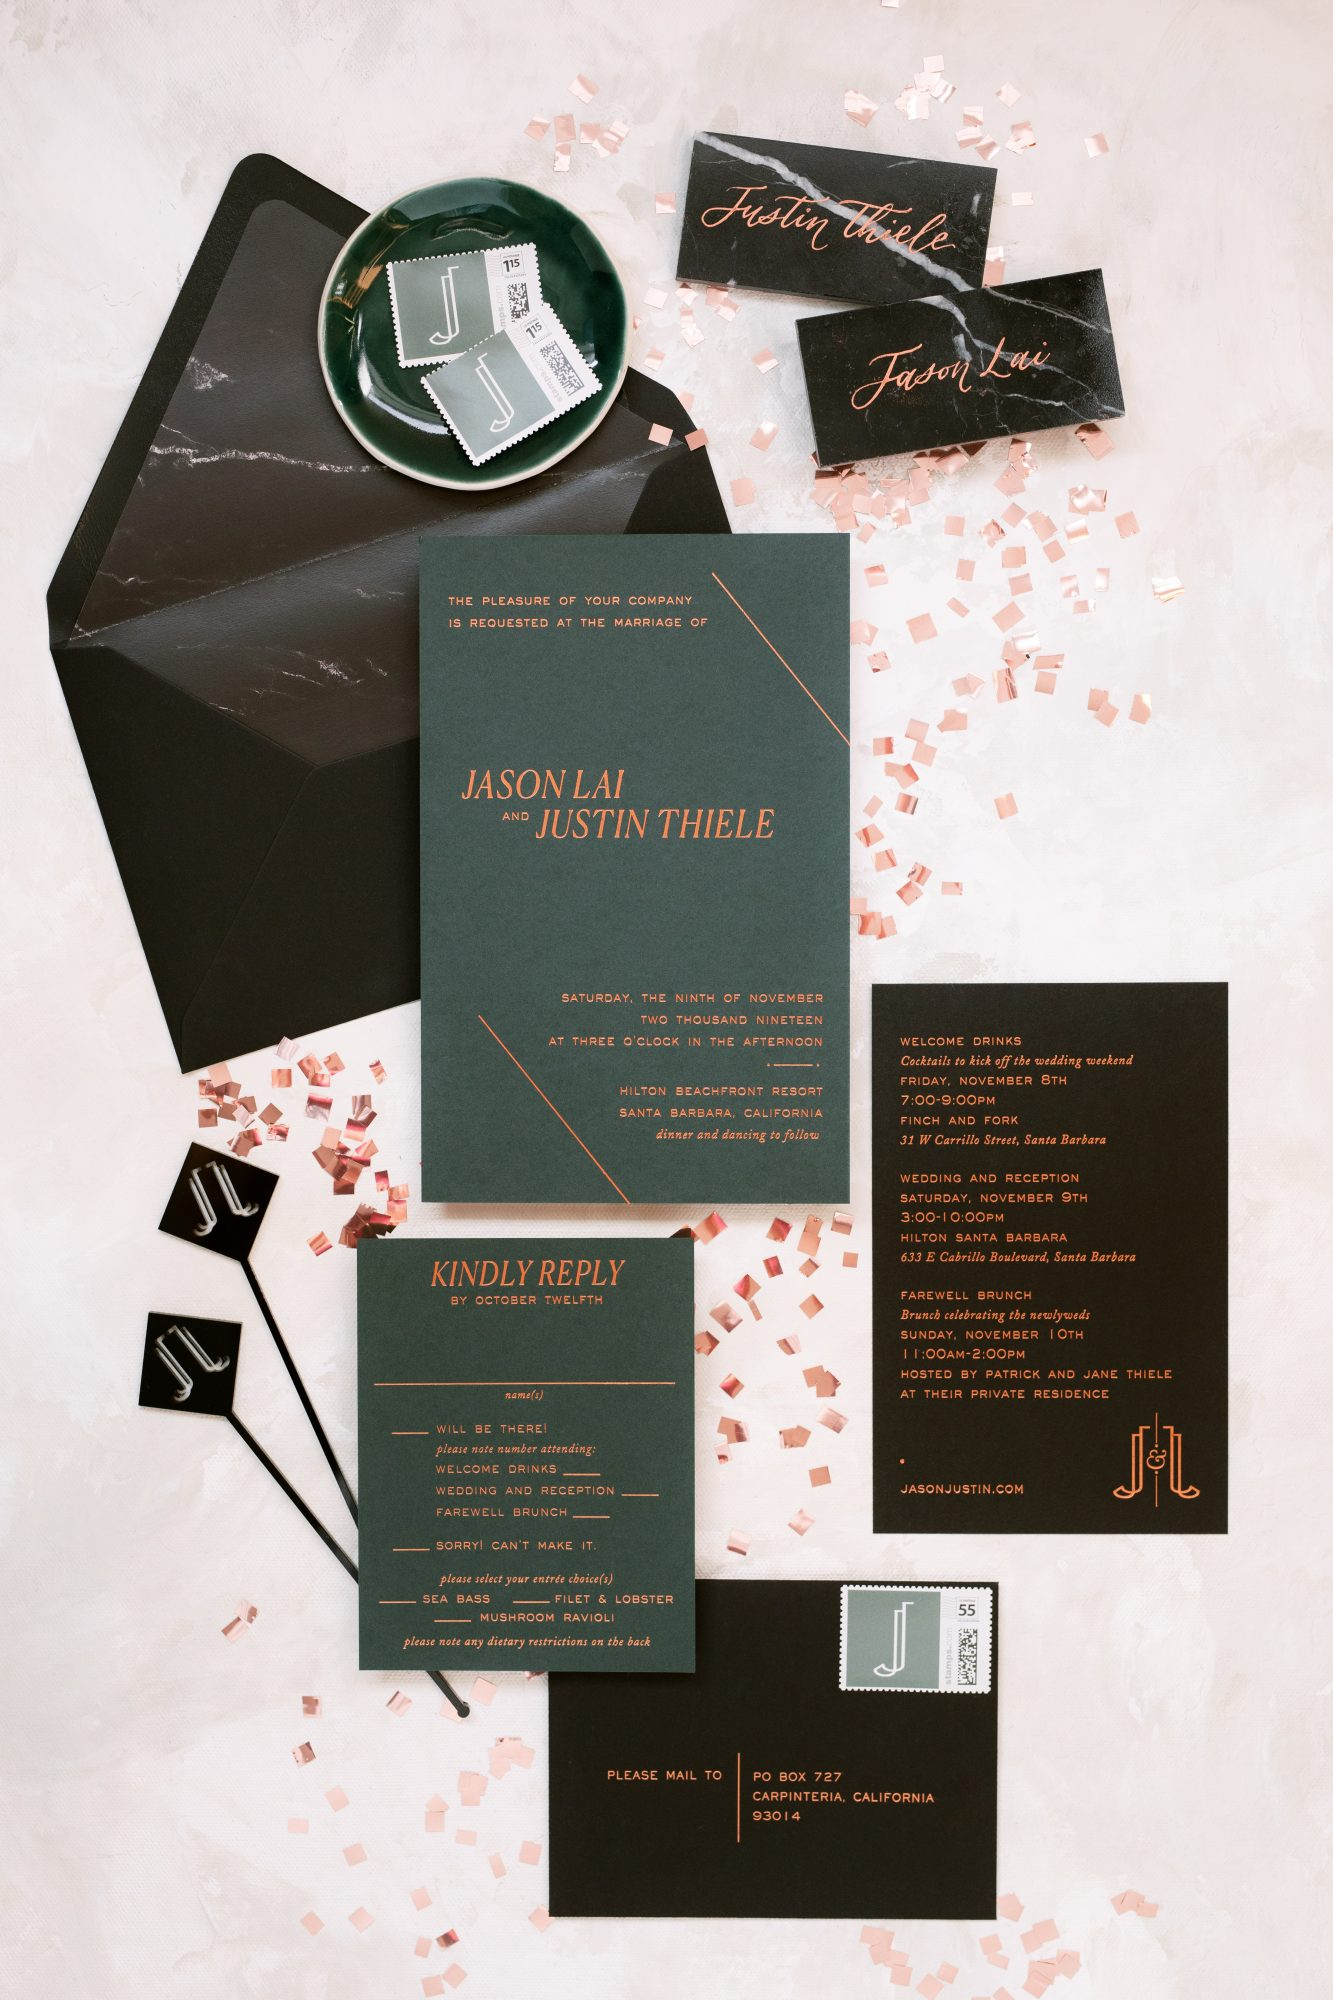 jason justin wedding invites